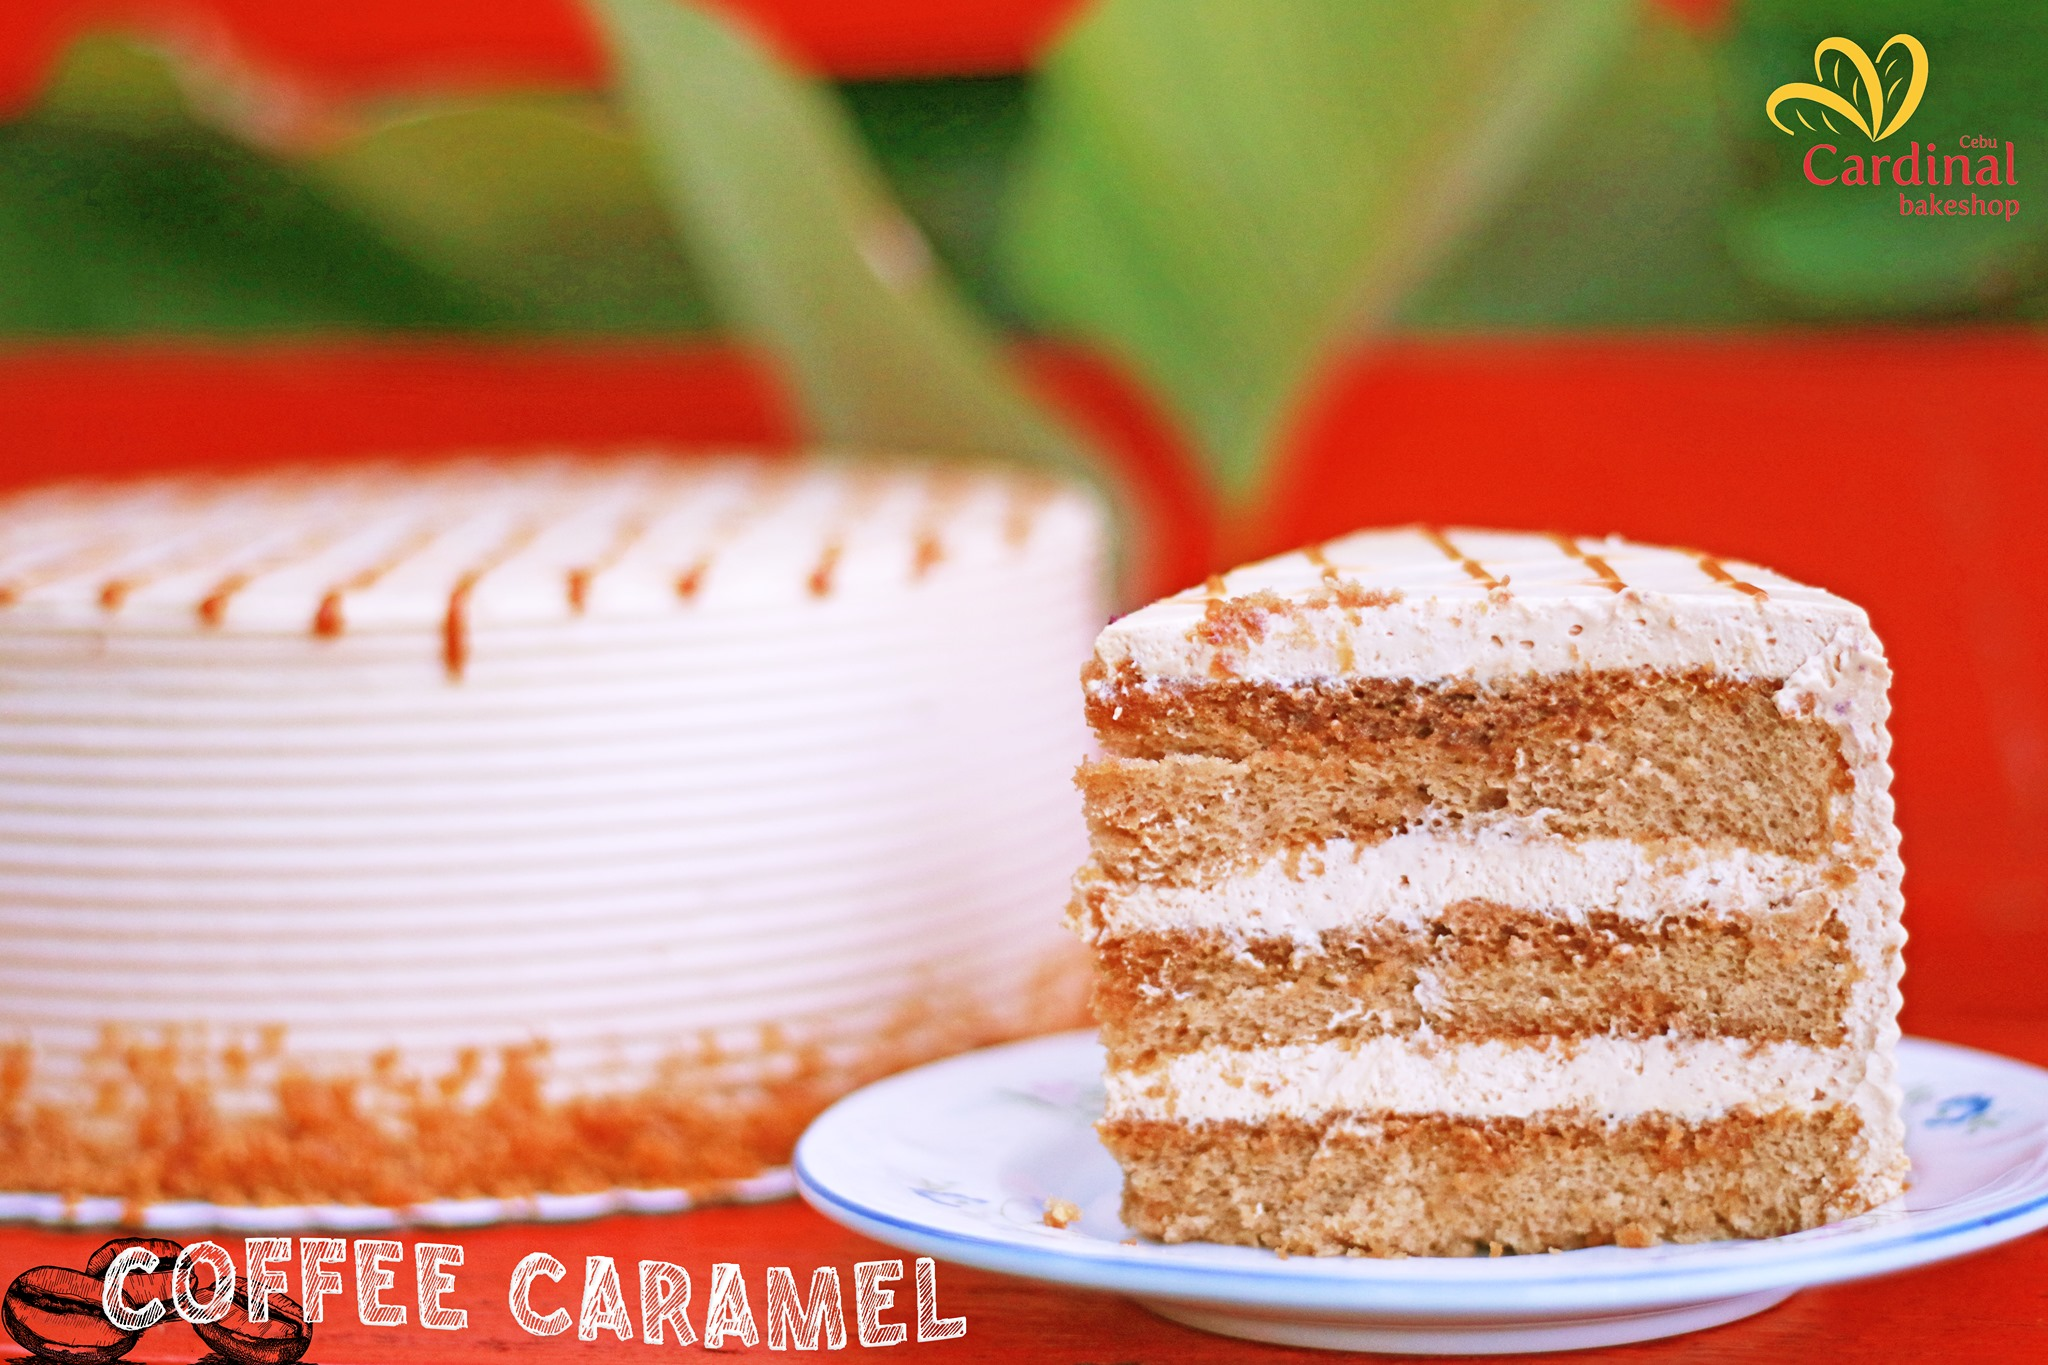 strawberry shortcake from cebu cardinal bakeshop